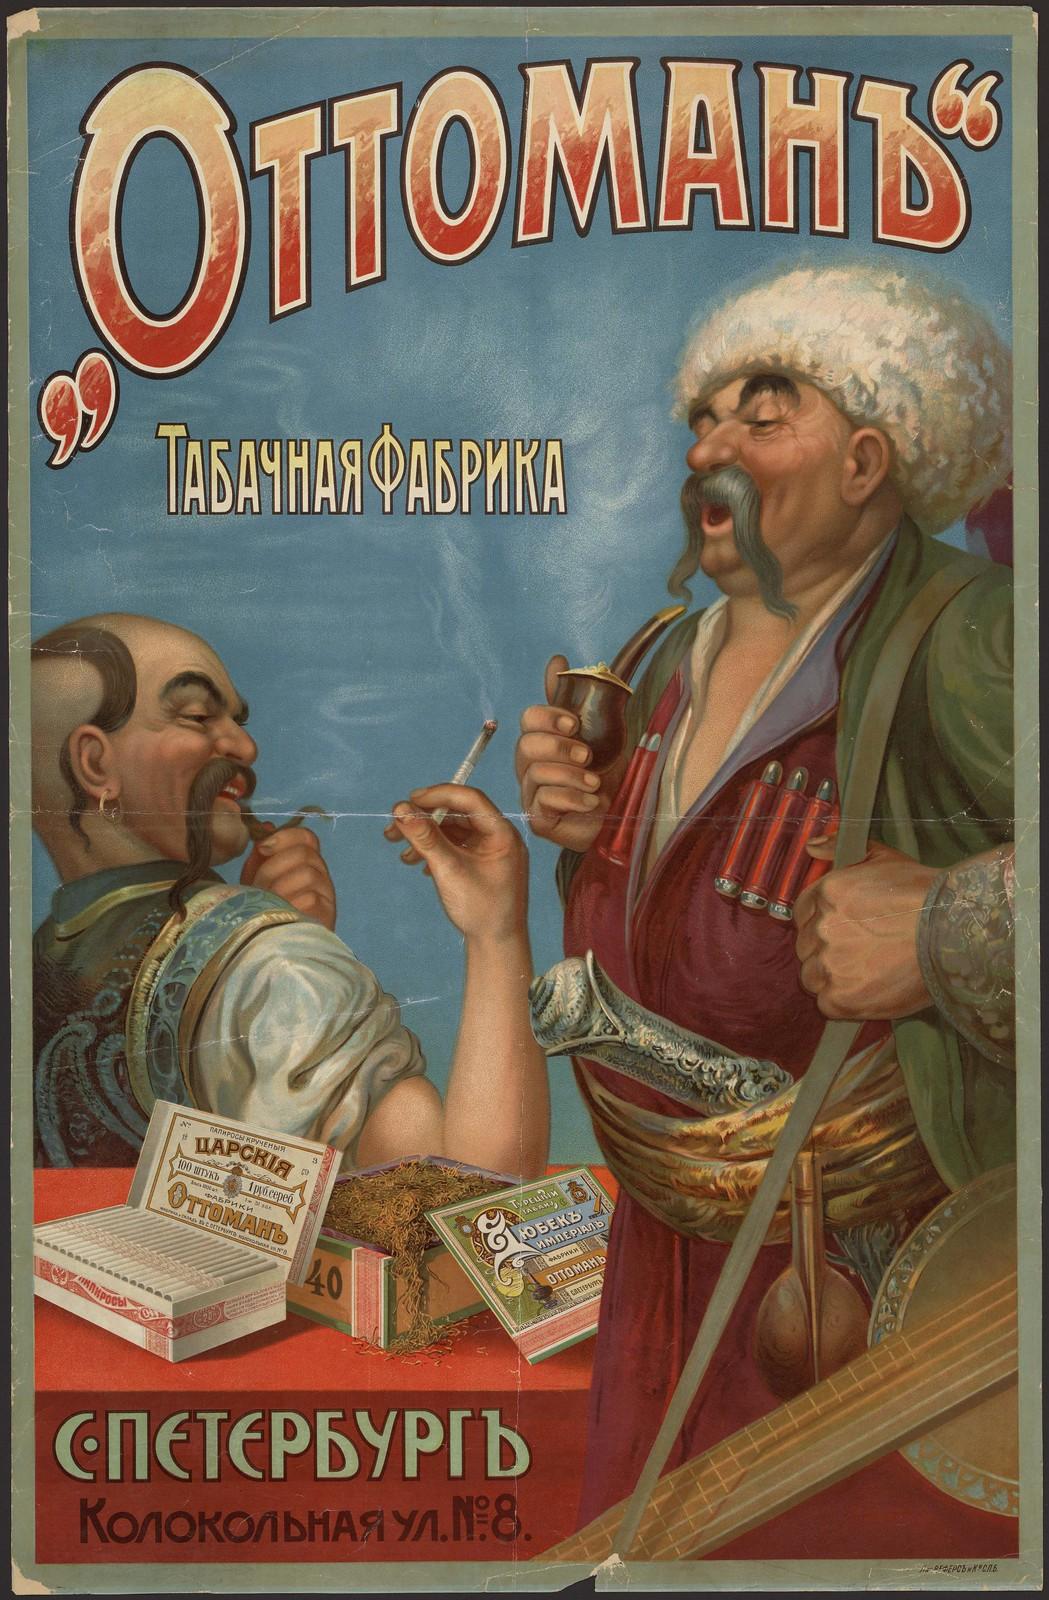 «Оттоман» Табачная фабрика. С.-Петербург. Папиросы крученые «Царские», турецкий табак «Юбек империал»